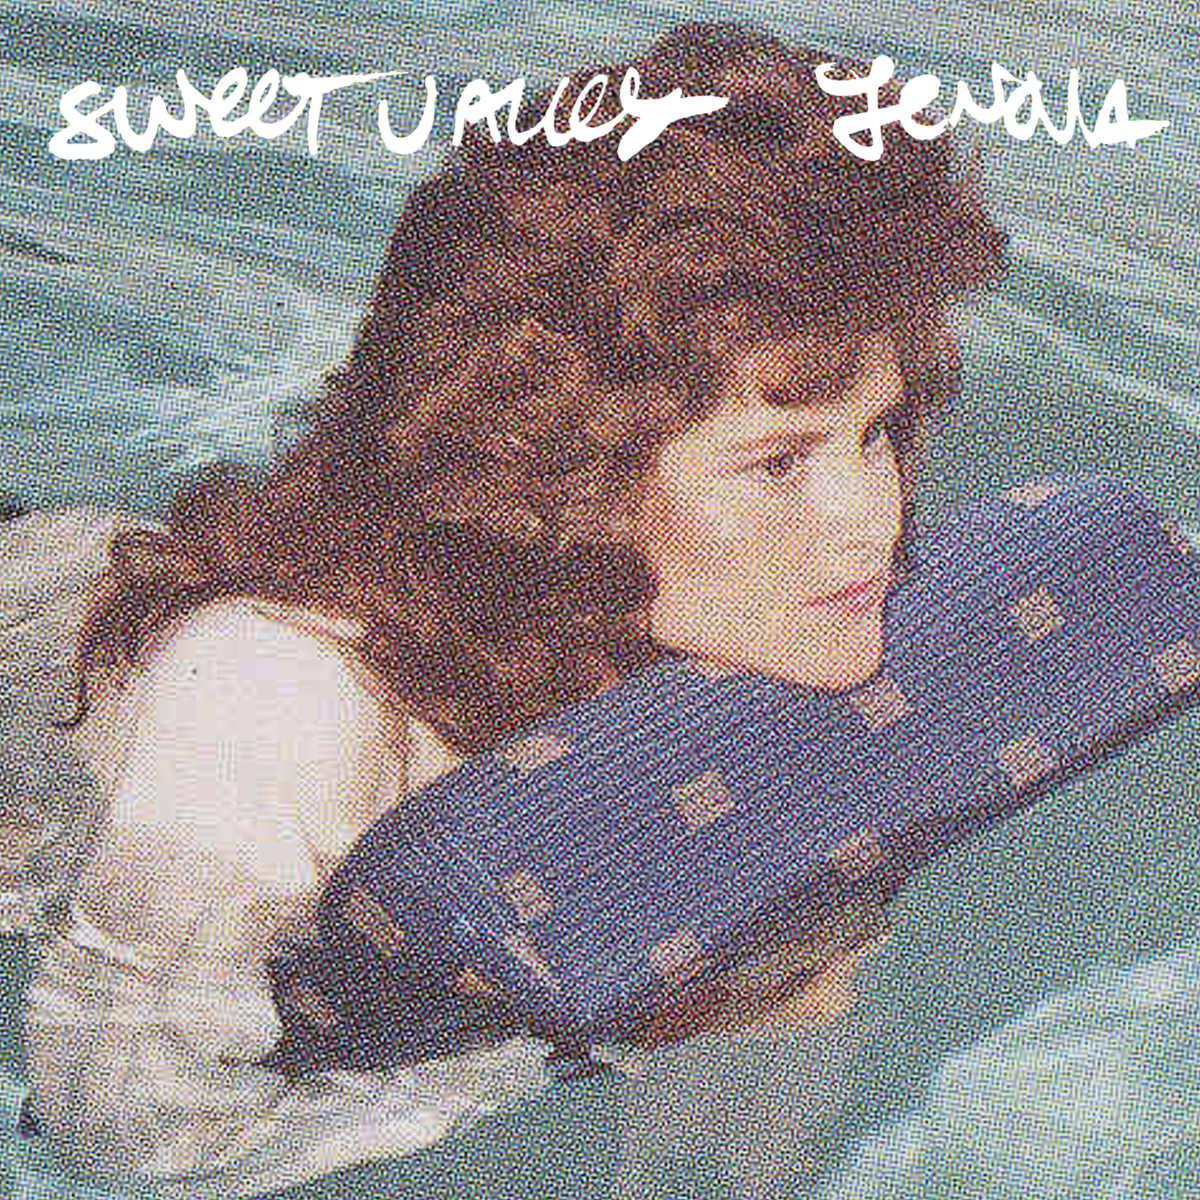 Sweet-Valley-Jenova-Final-Fantasy-Vii-video-game-music-album